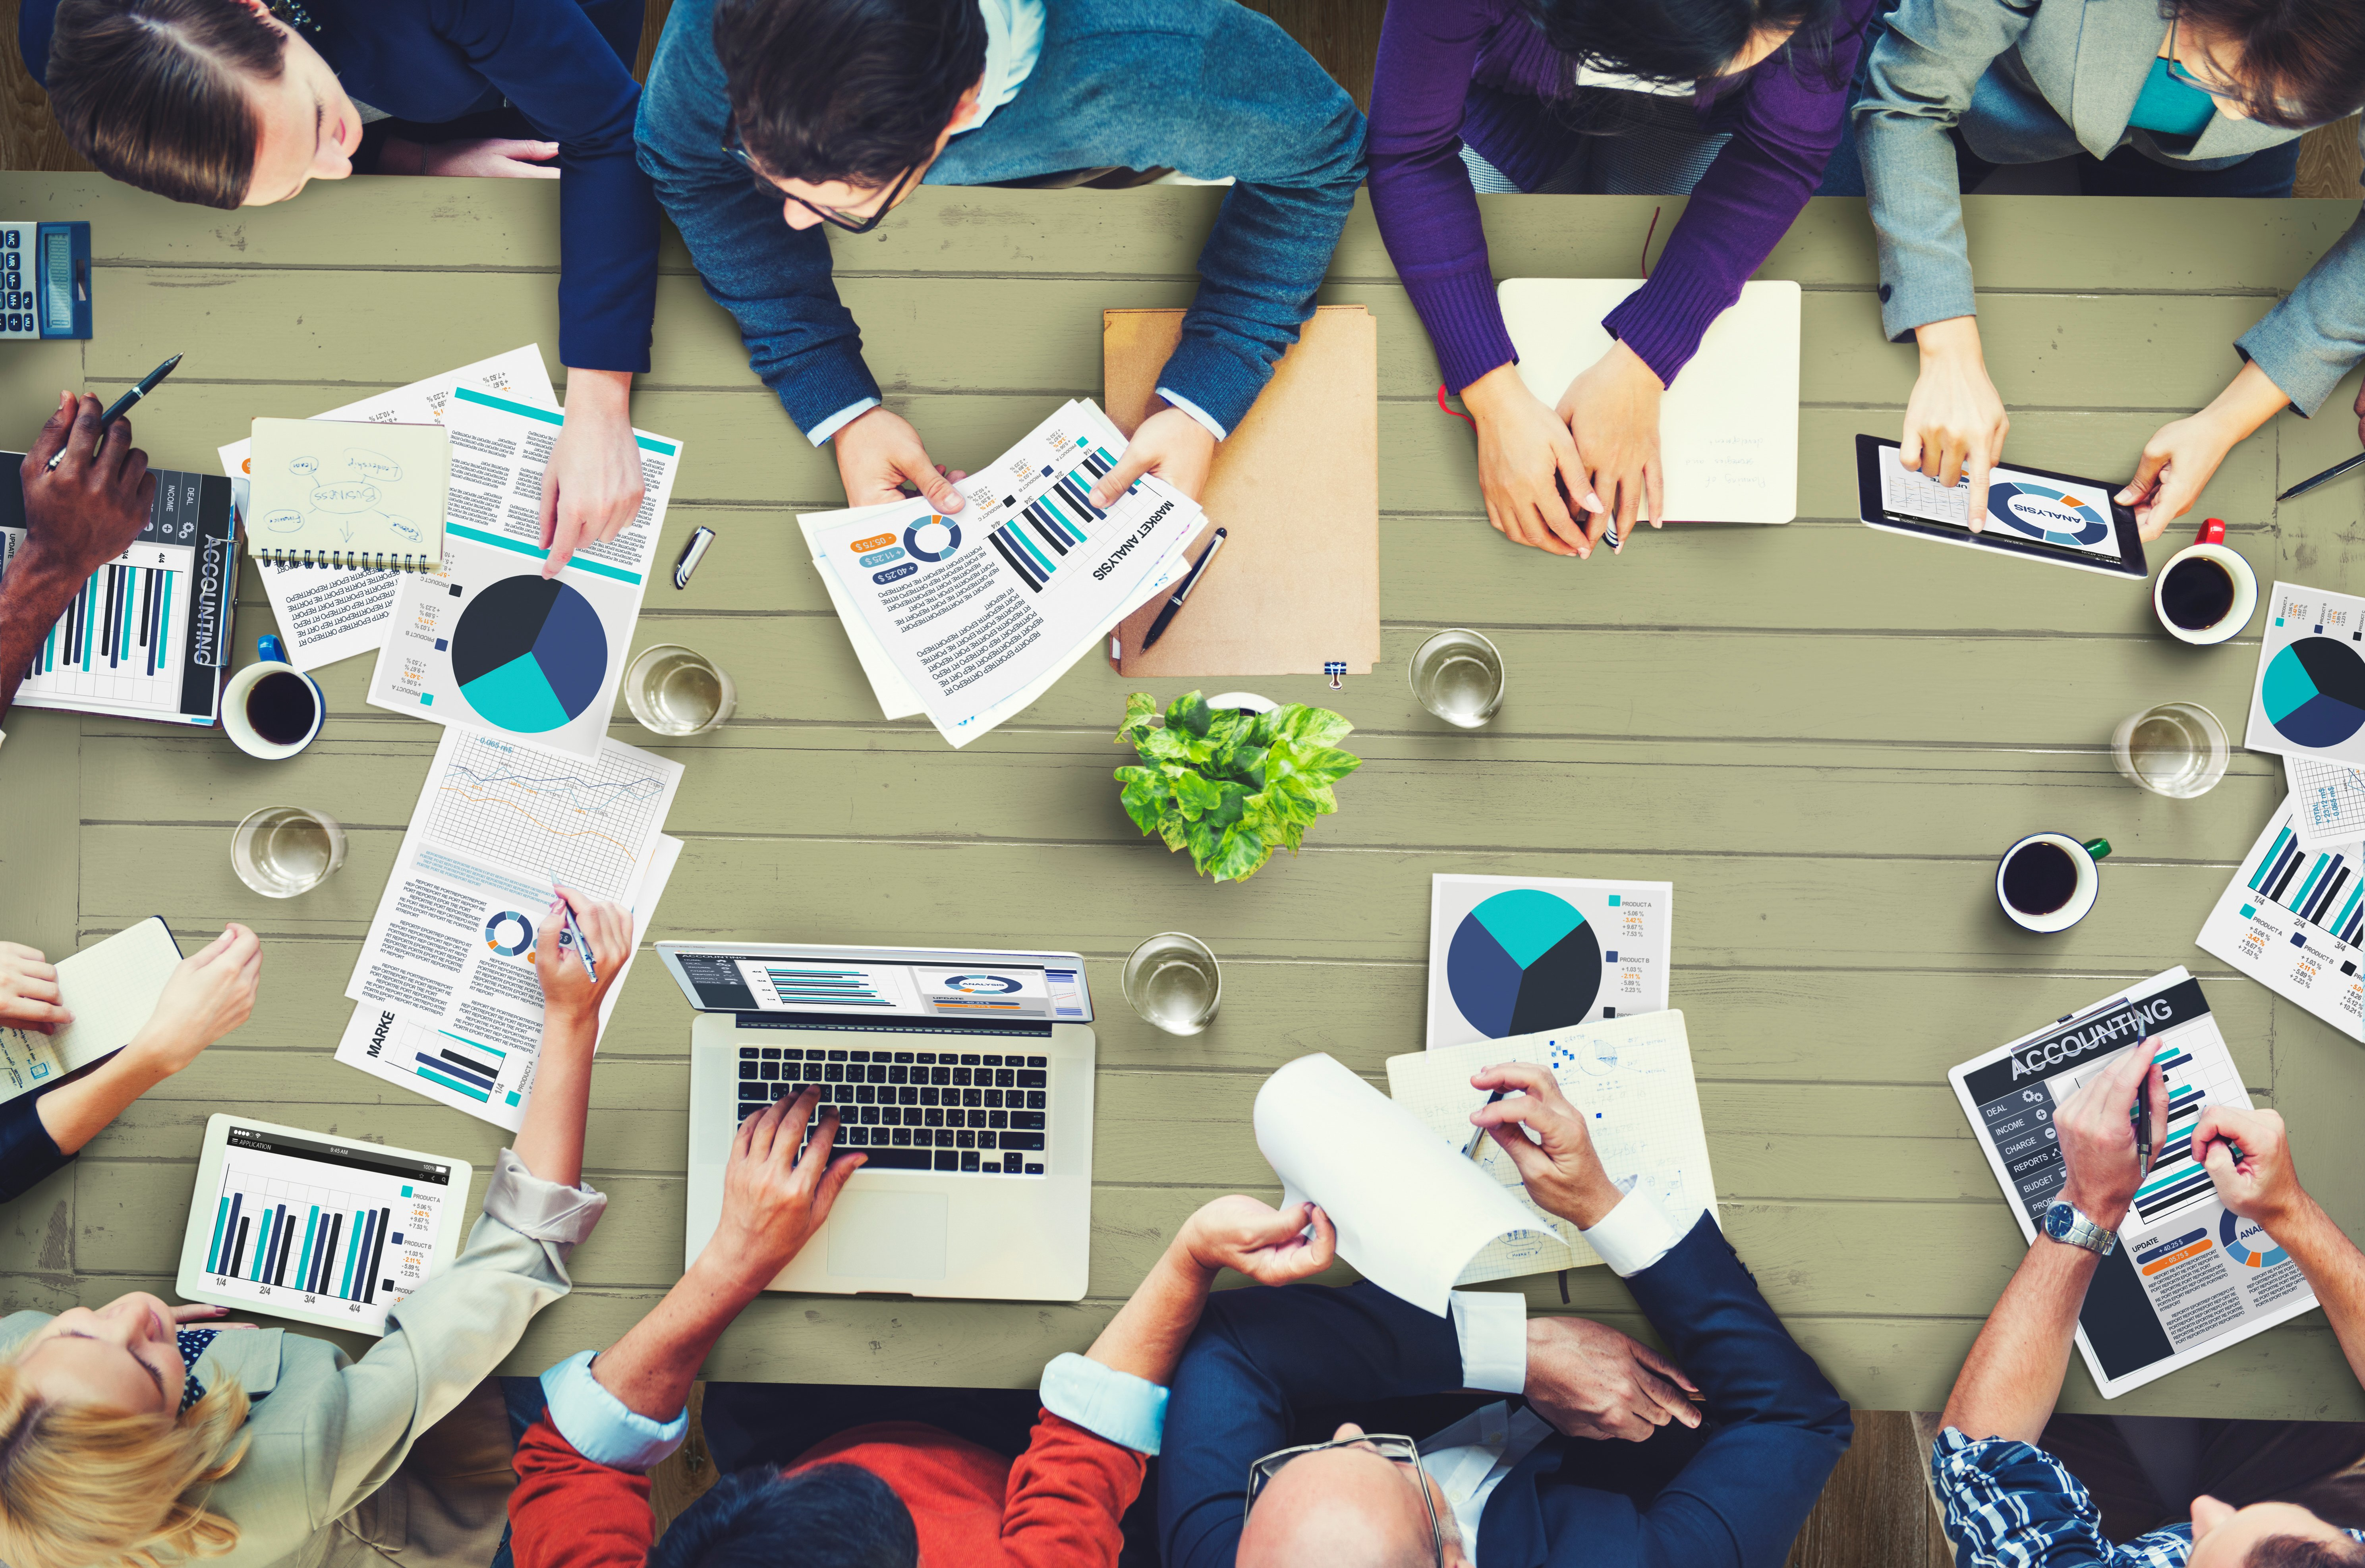 associated-pressmarketing-evolution-announces-new-industry-standard-for-data-quality-assurance